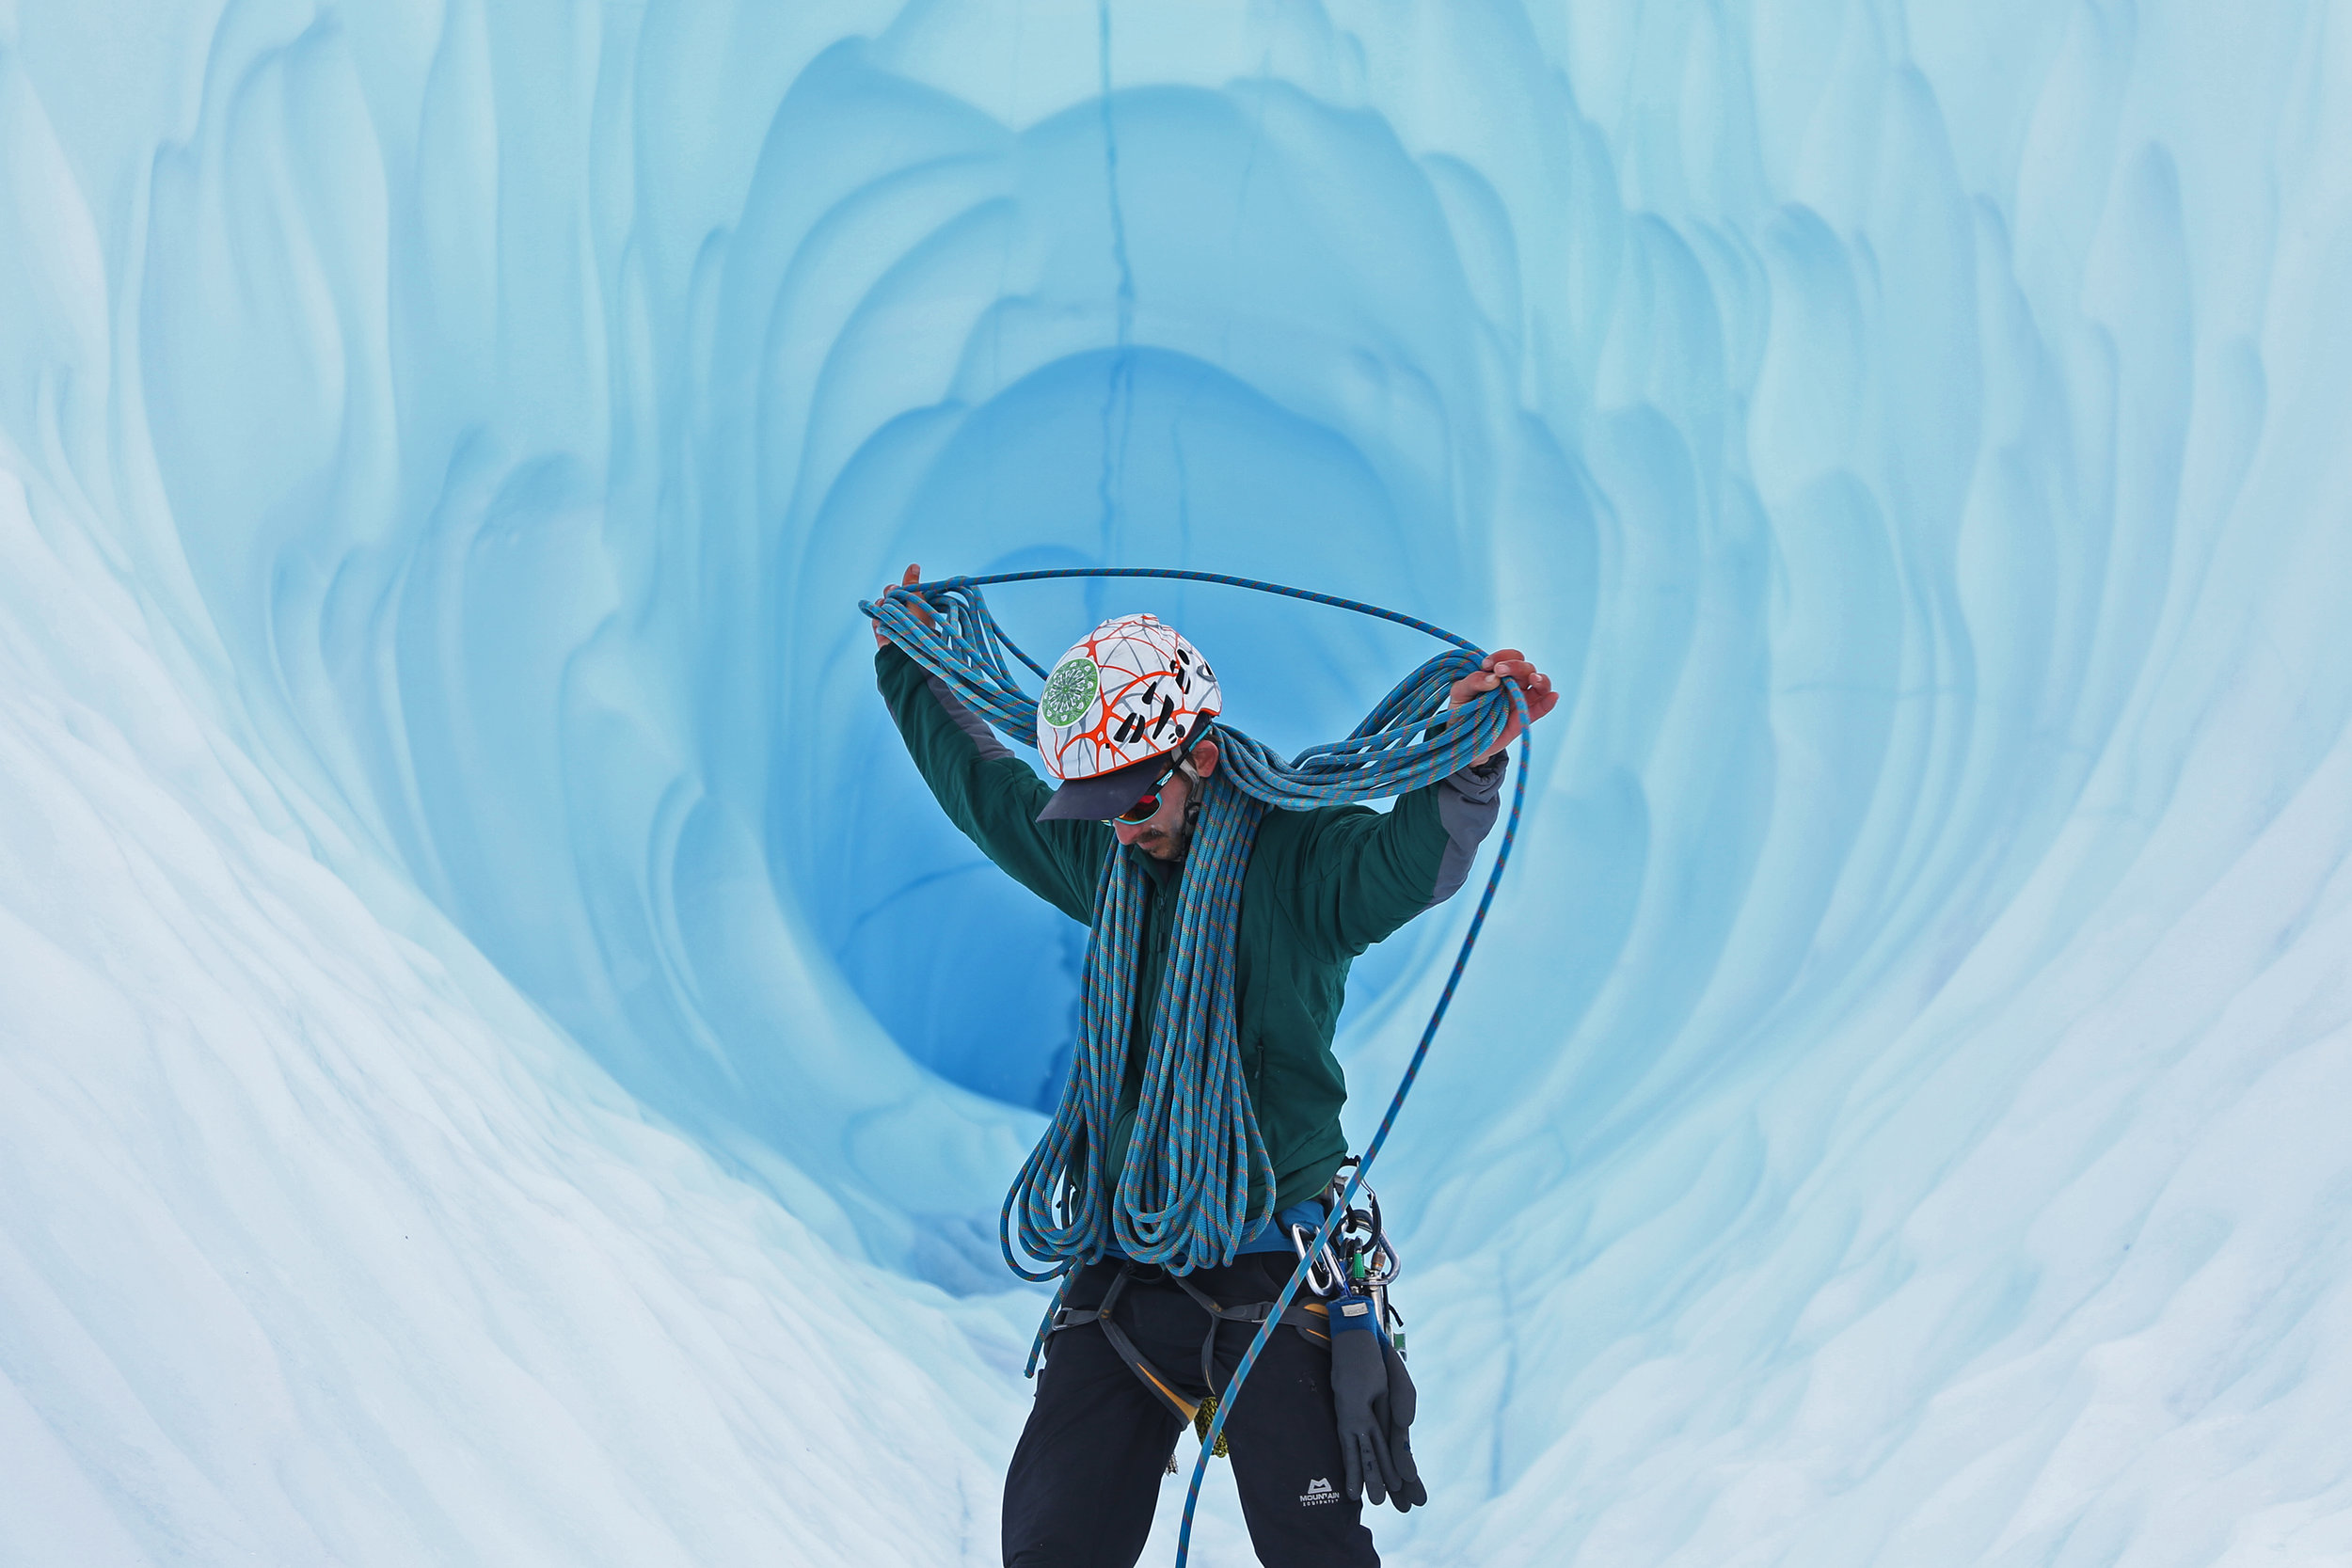 Brett Ryne coils a rope after climbing an ice wall at the Matanuska Glacier in Alaska | July 2019